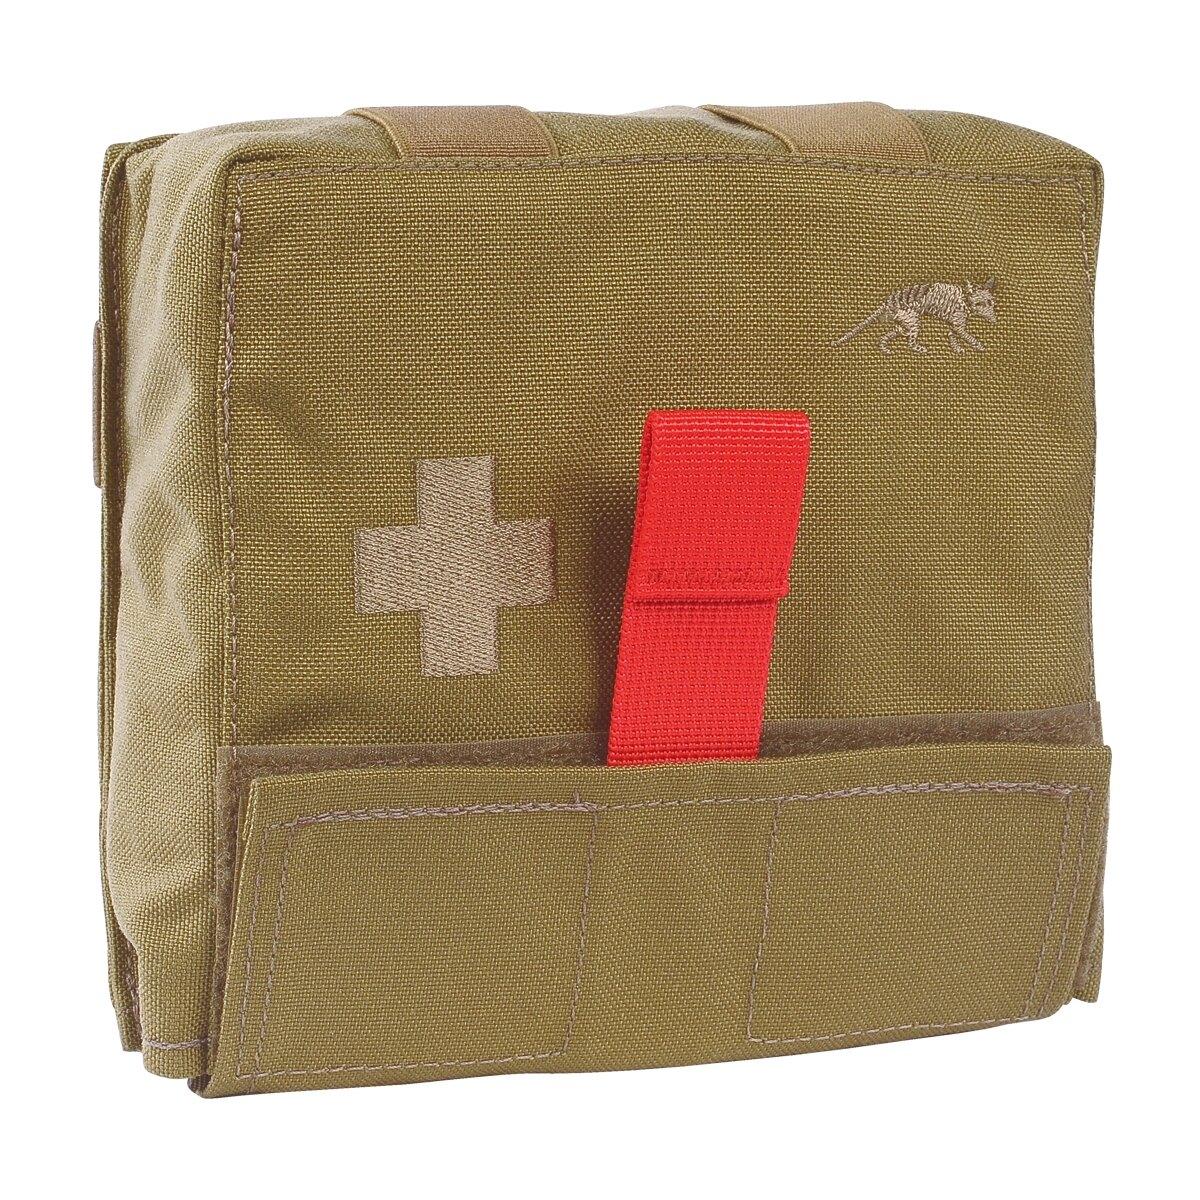 Puzdro na zdravotnícke potreby Tasmanian Tiger® IFAK Pouch S - khaki (Farba: Khaki)